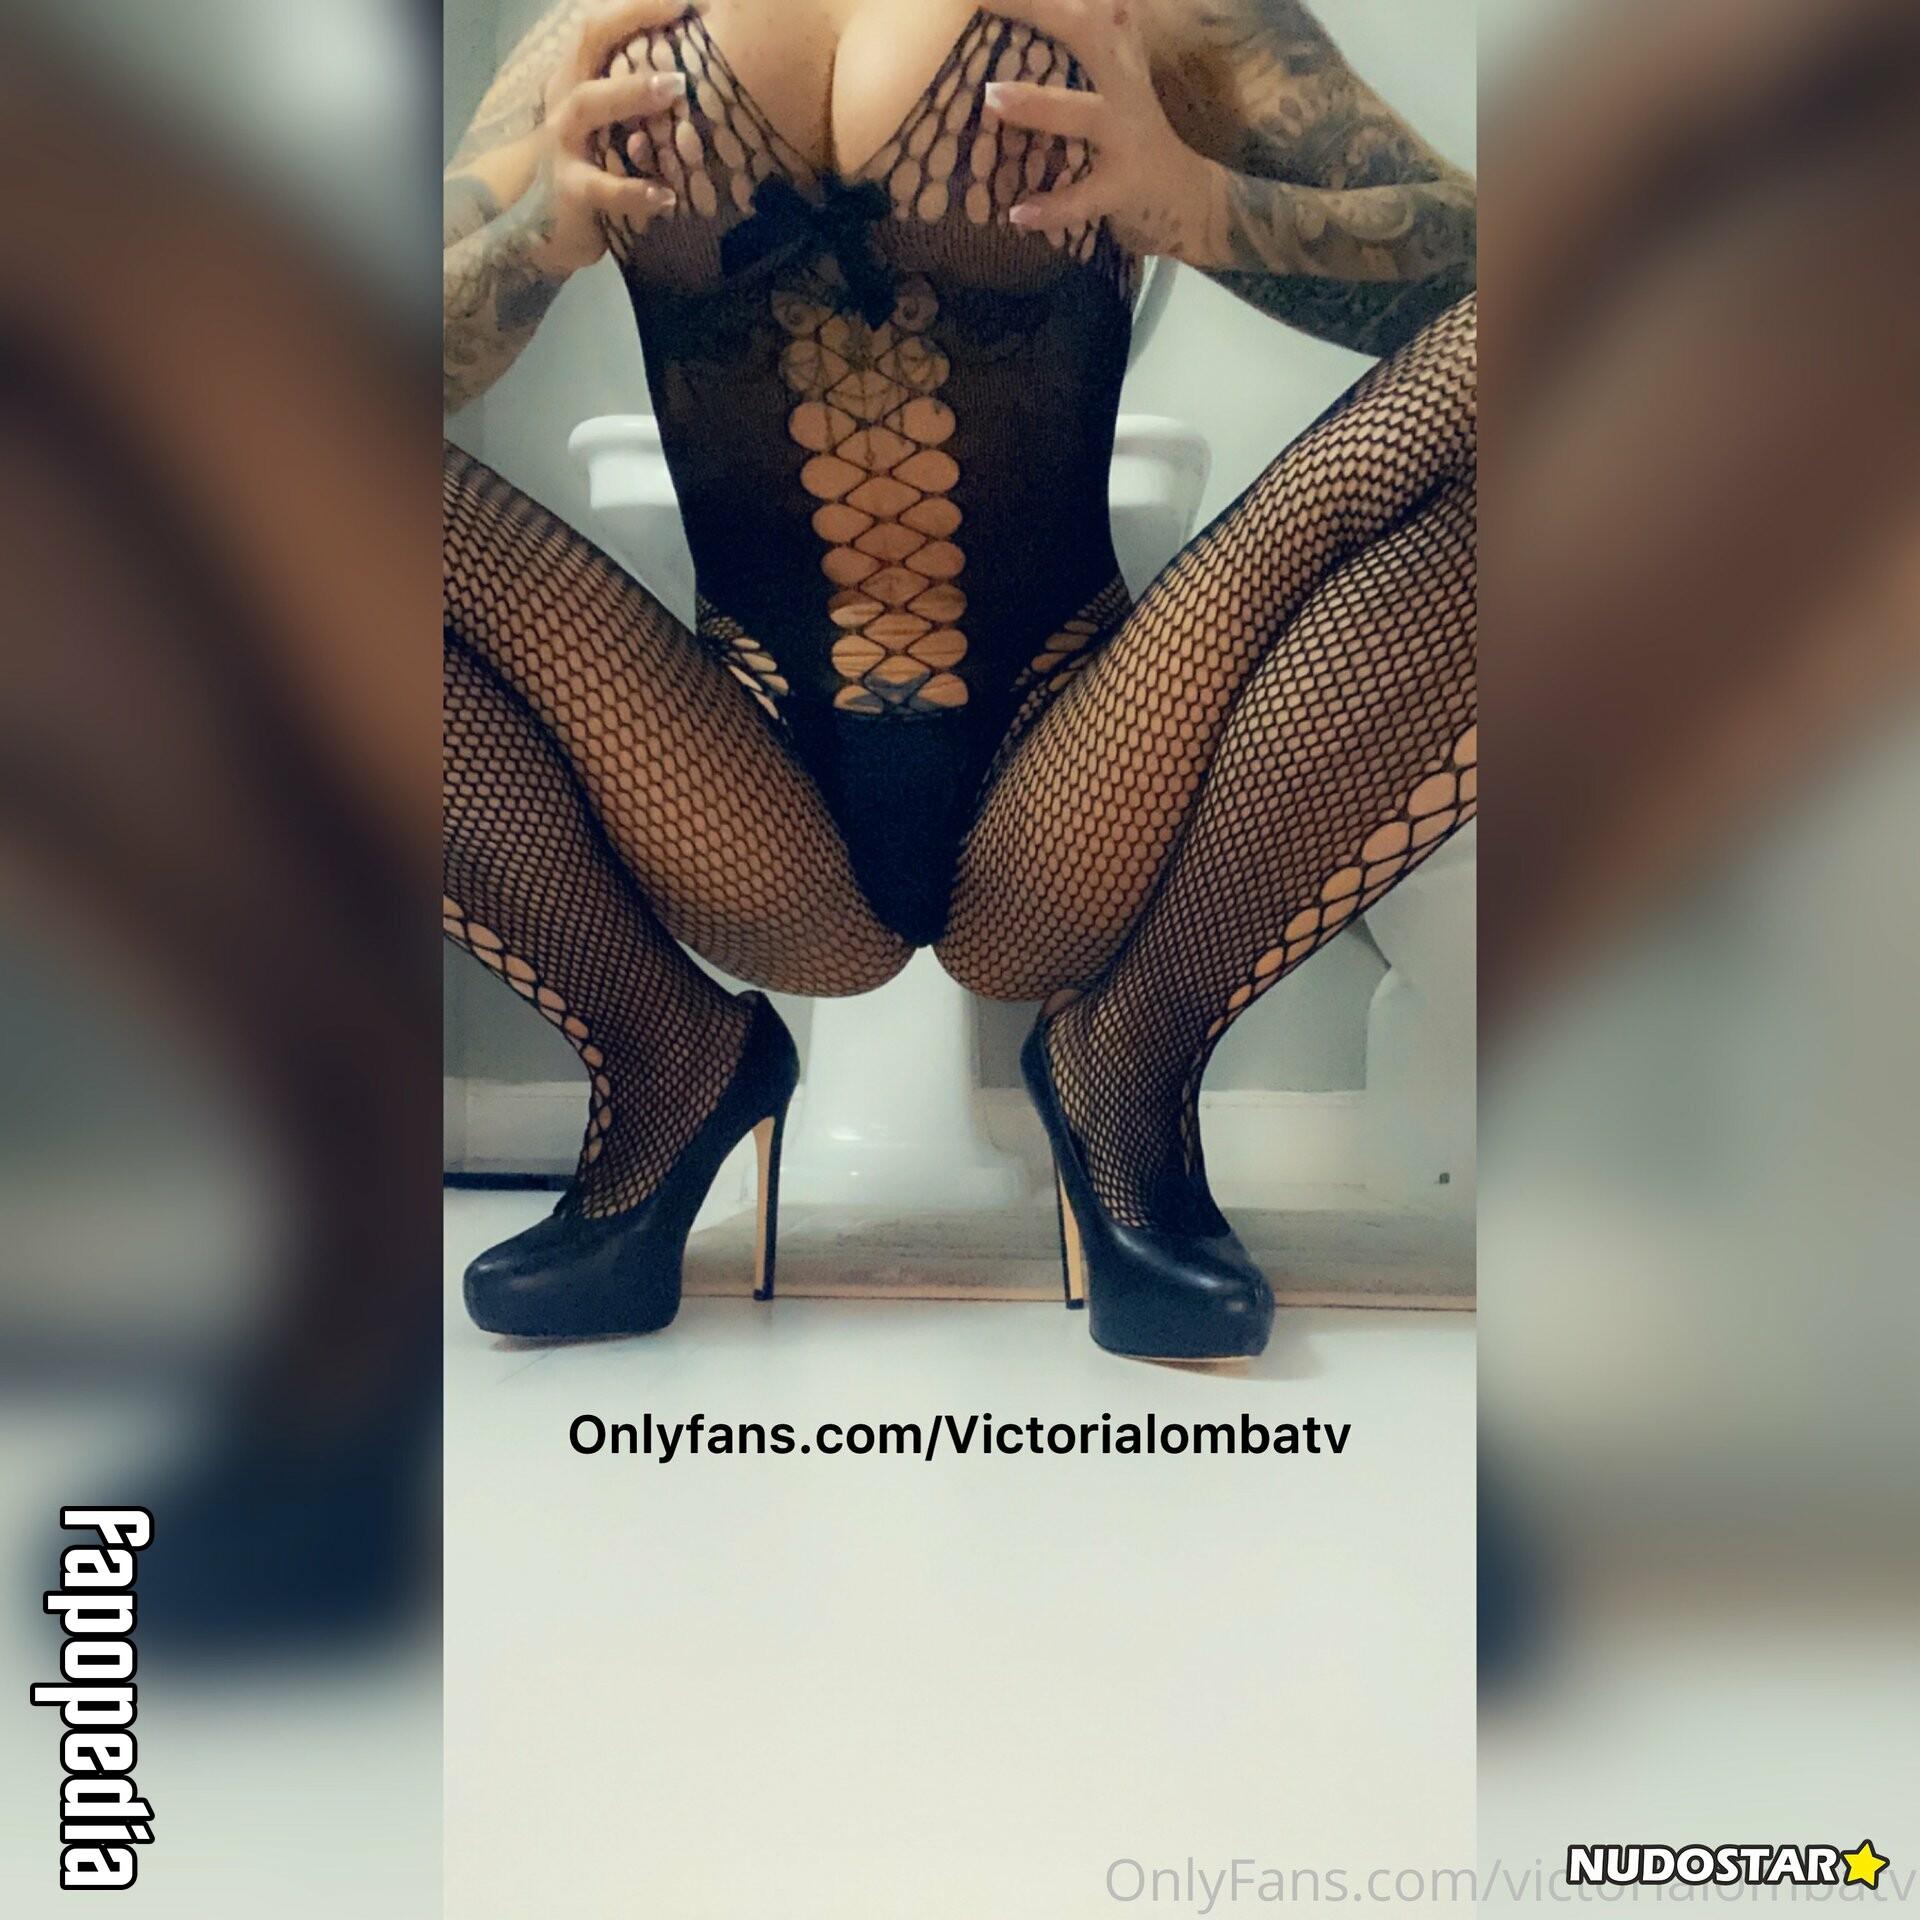 Victorialombatv Nude OnlyFans Leaks